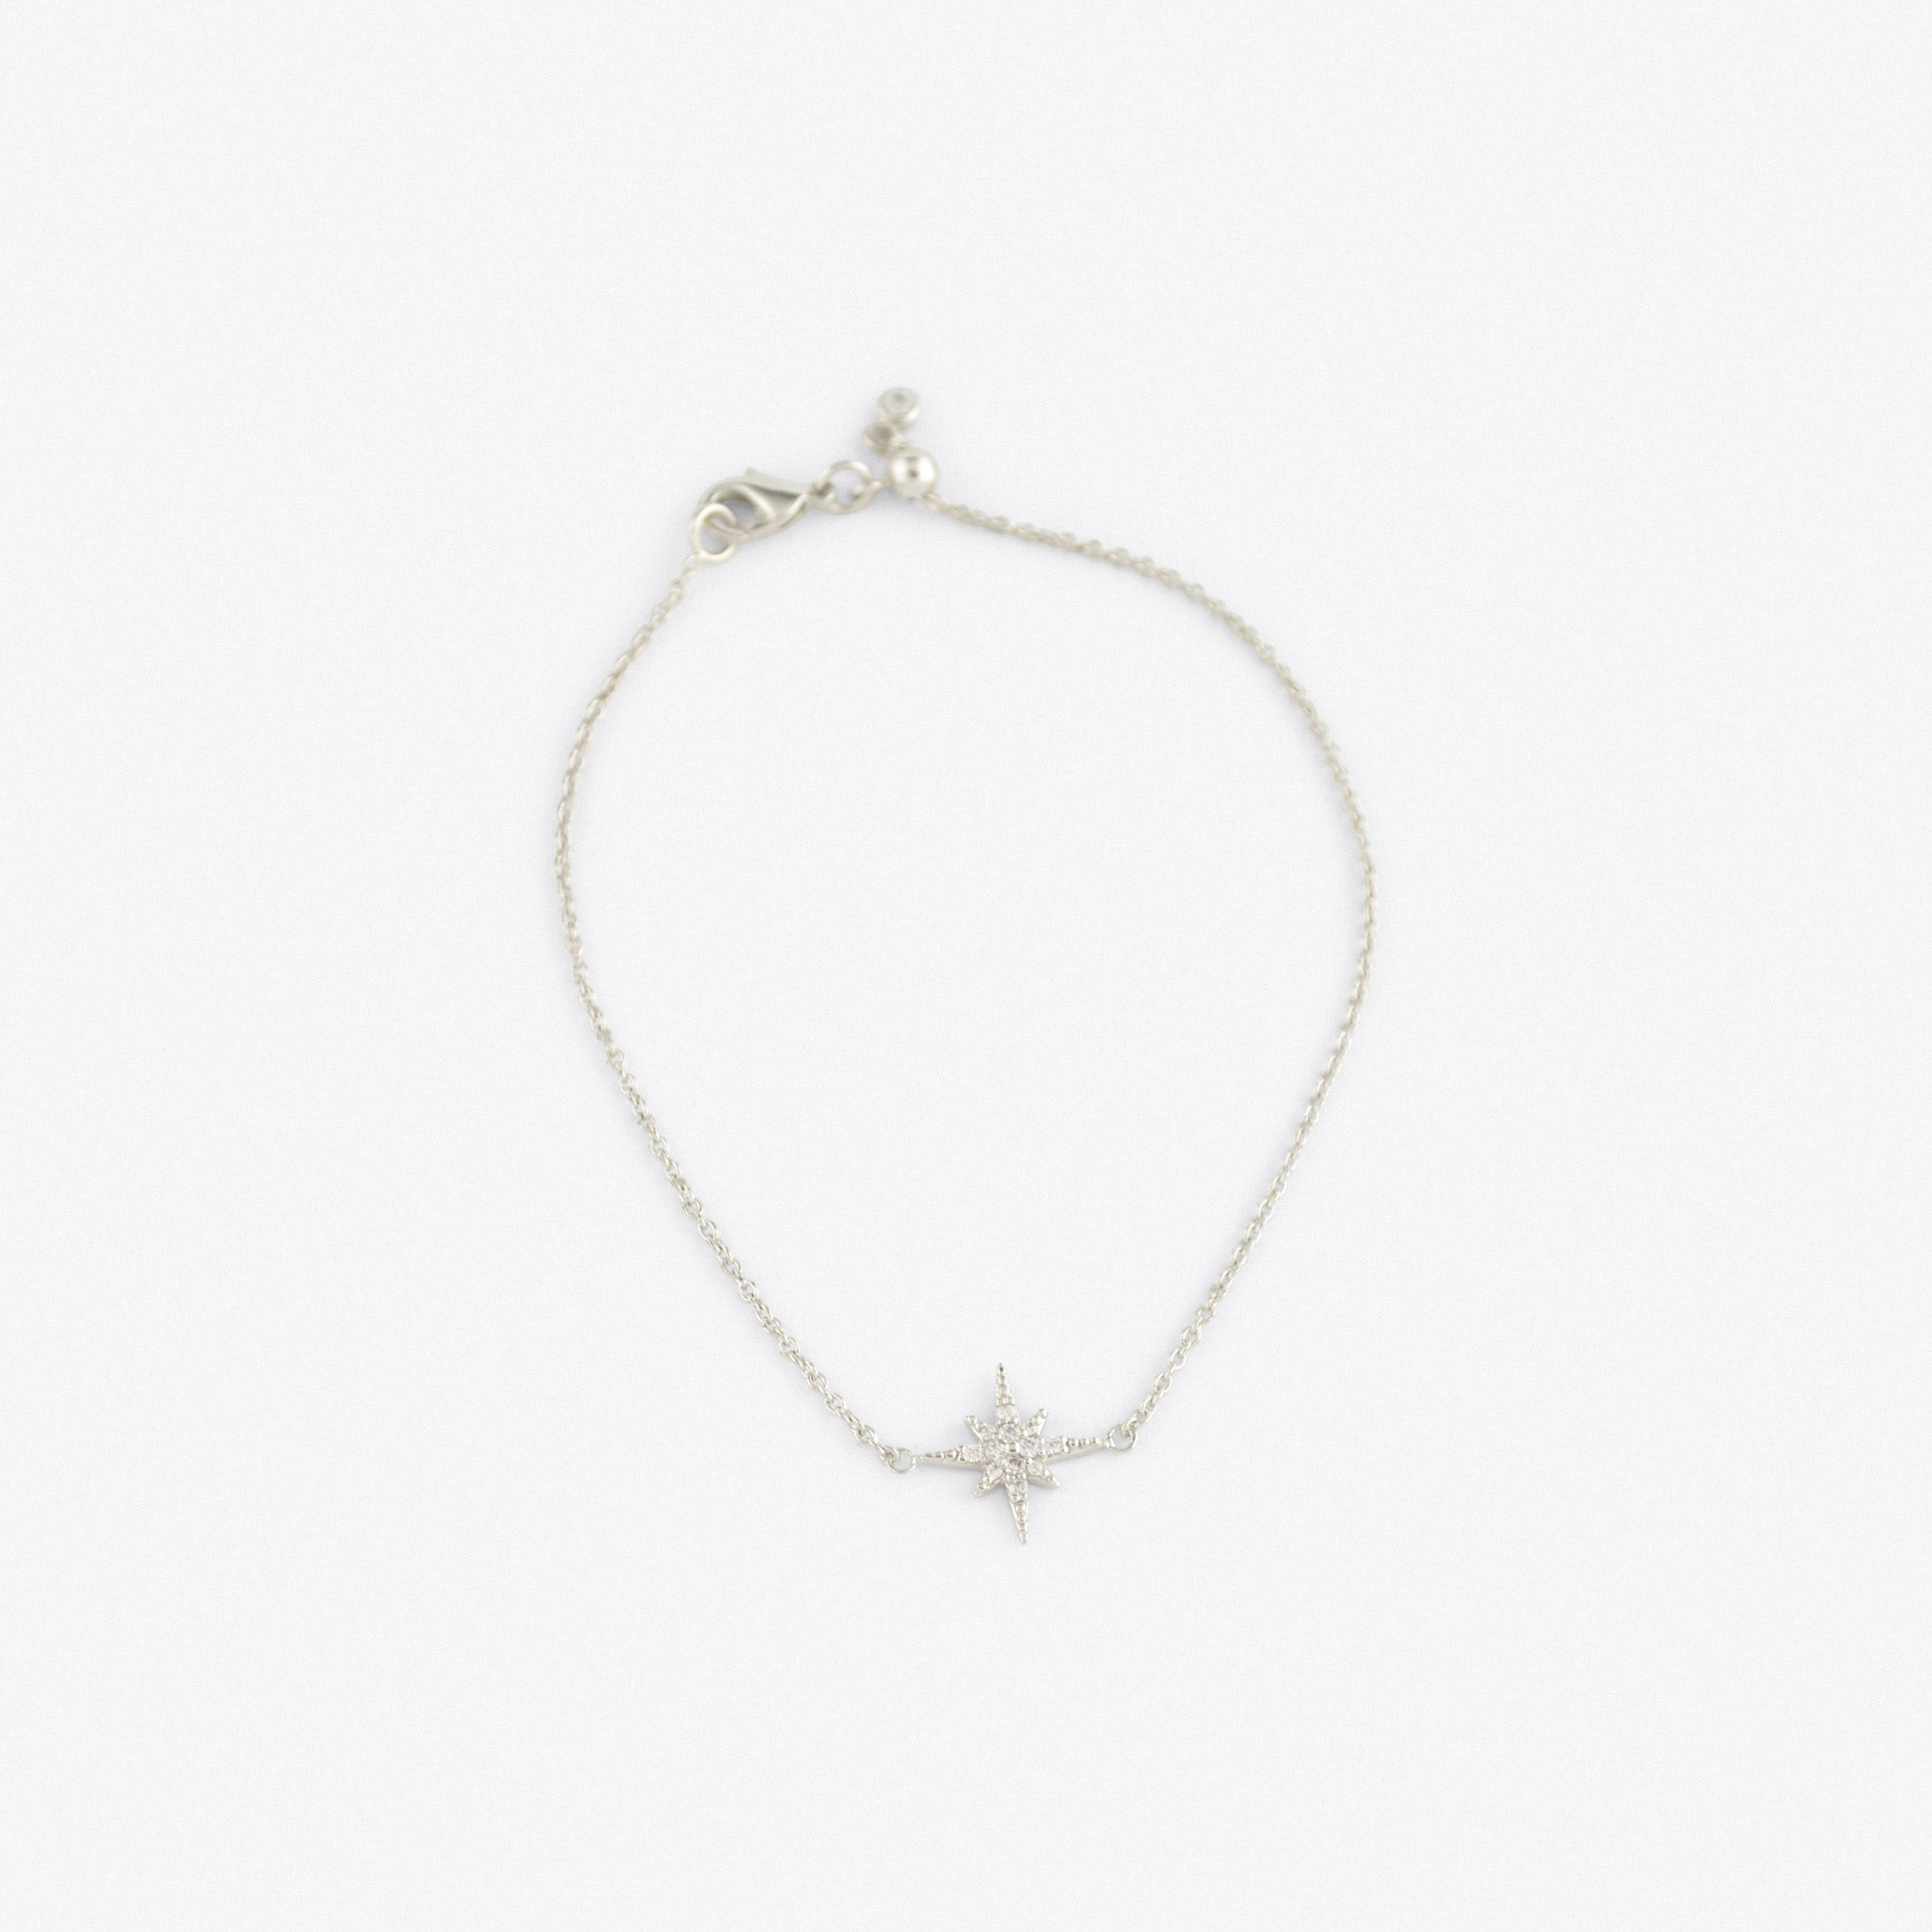 Starburst Bracelet with Slider Clasp in Silver